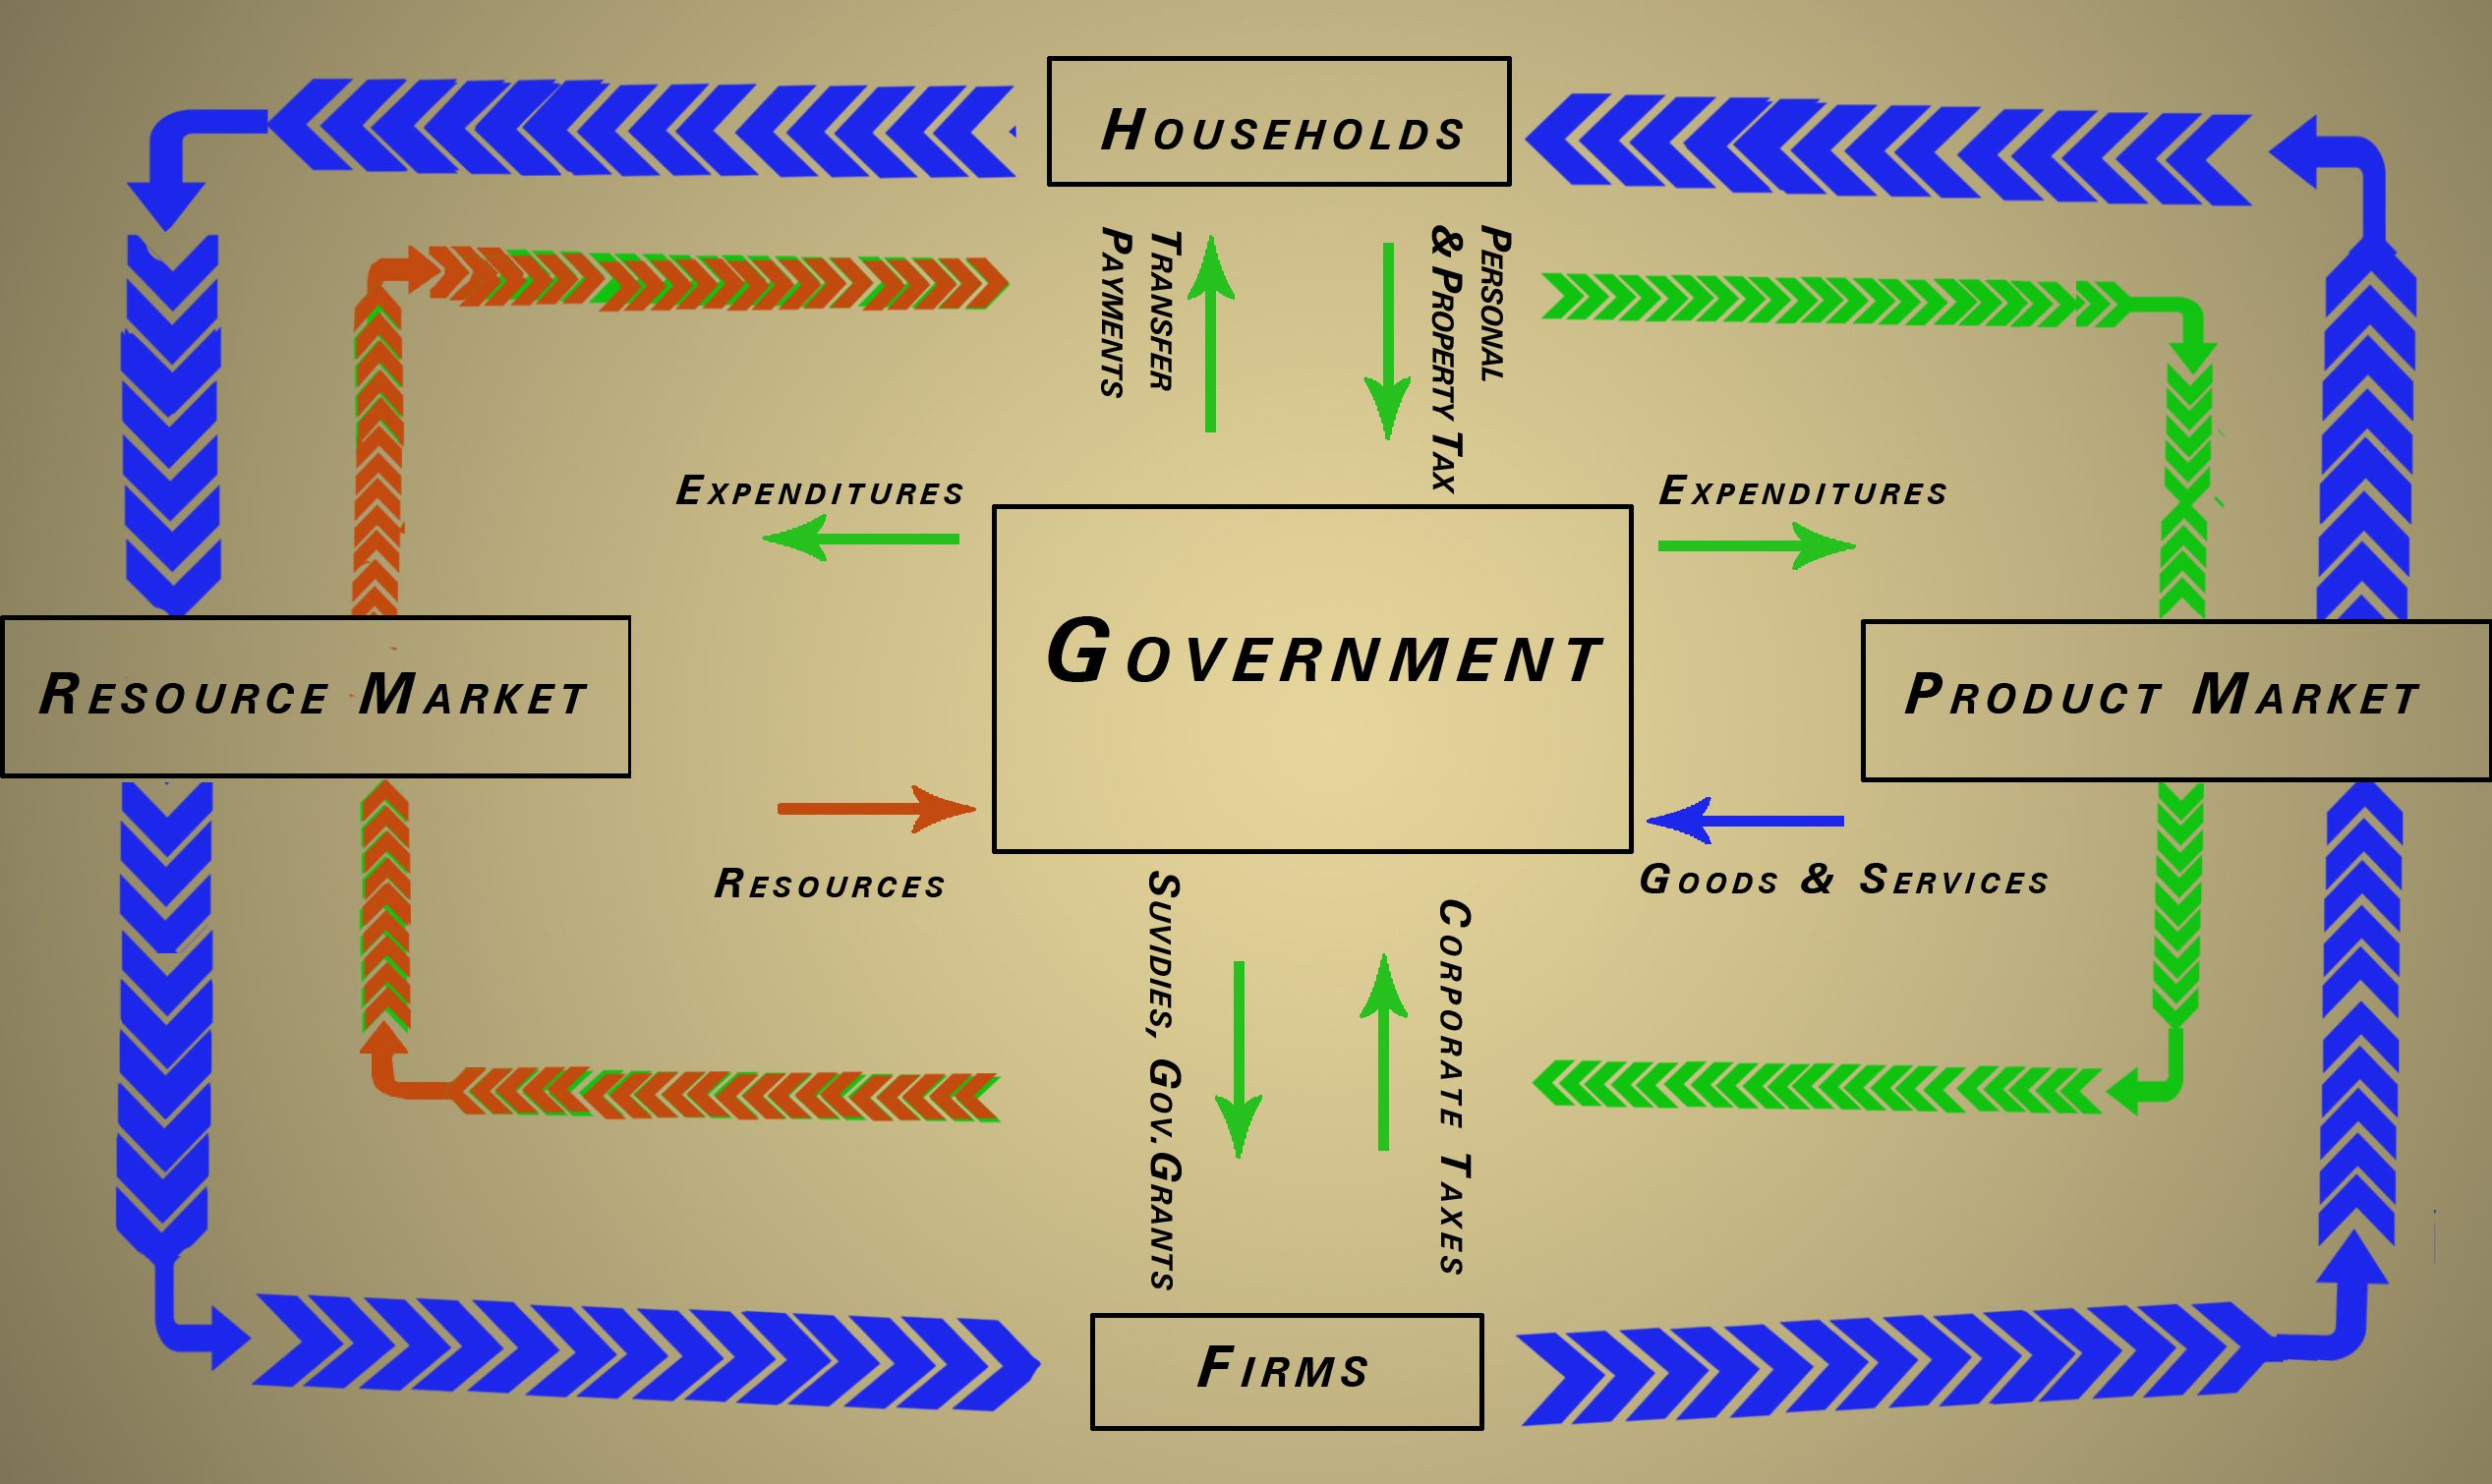 Microeconomics And Macroeconomic Have Different Type Of